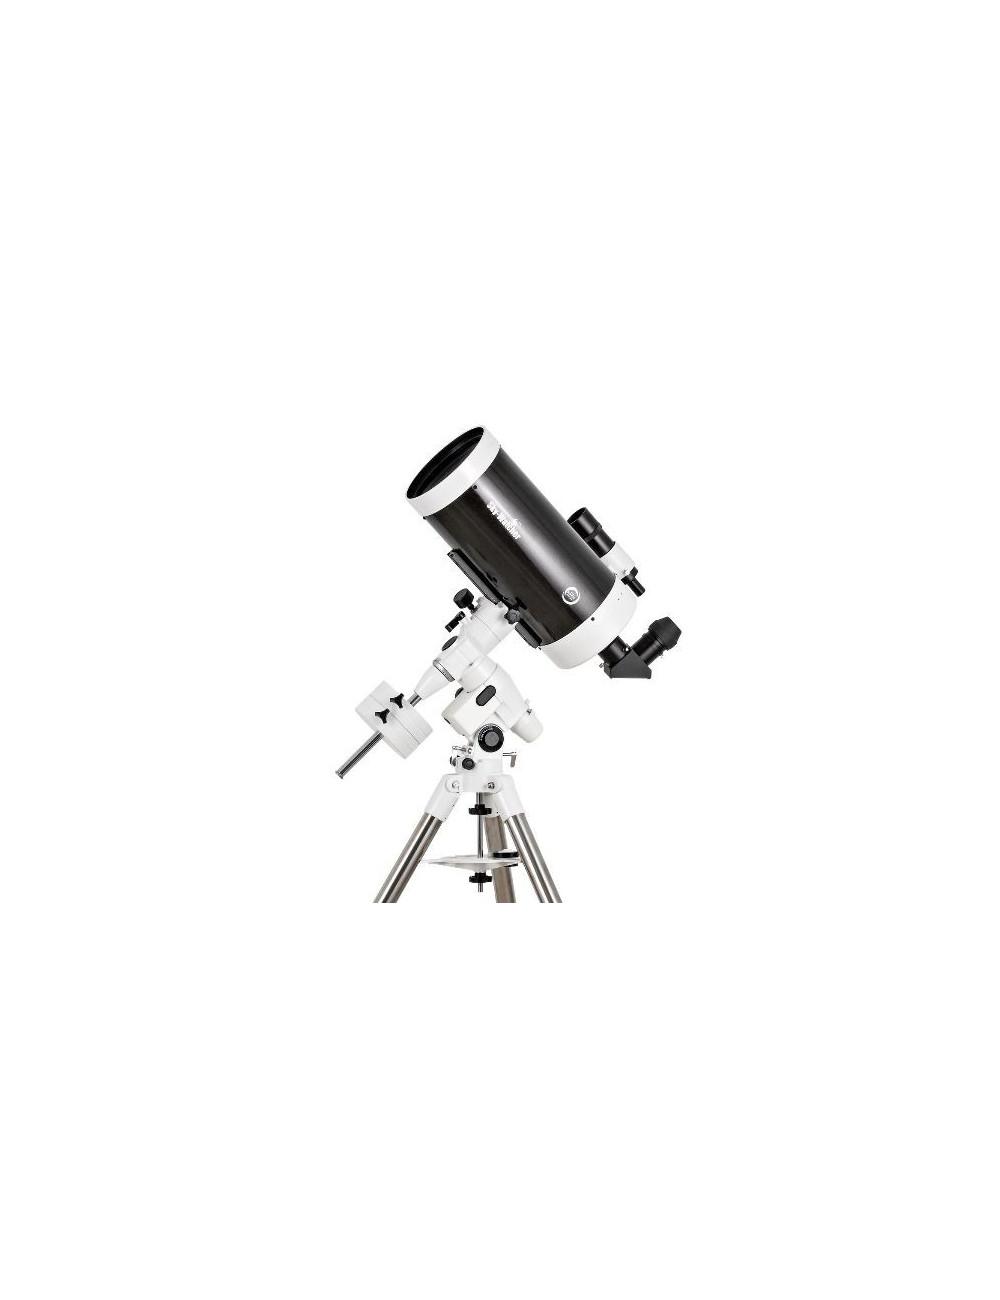 Télescope Sky-Watcher Mak180 Black Diamond sur NEQ5